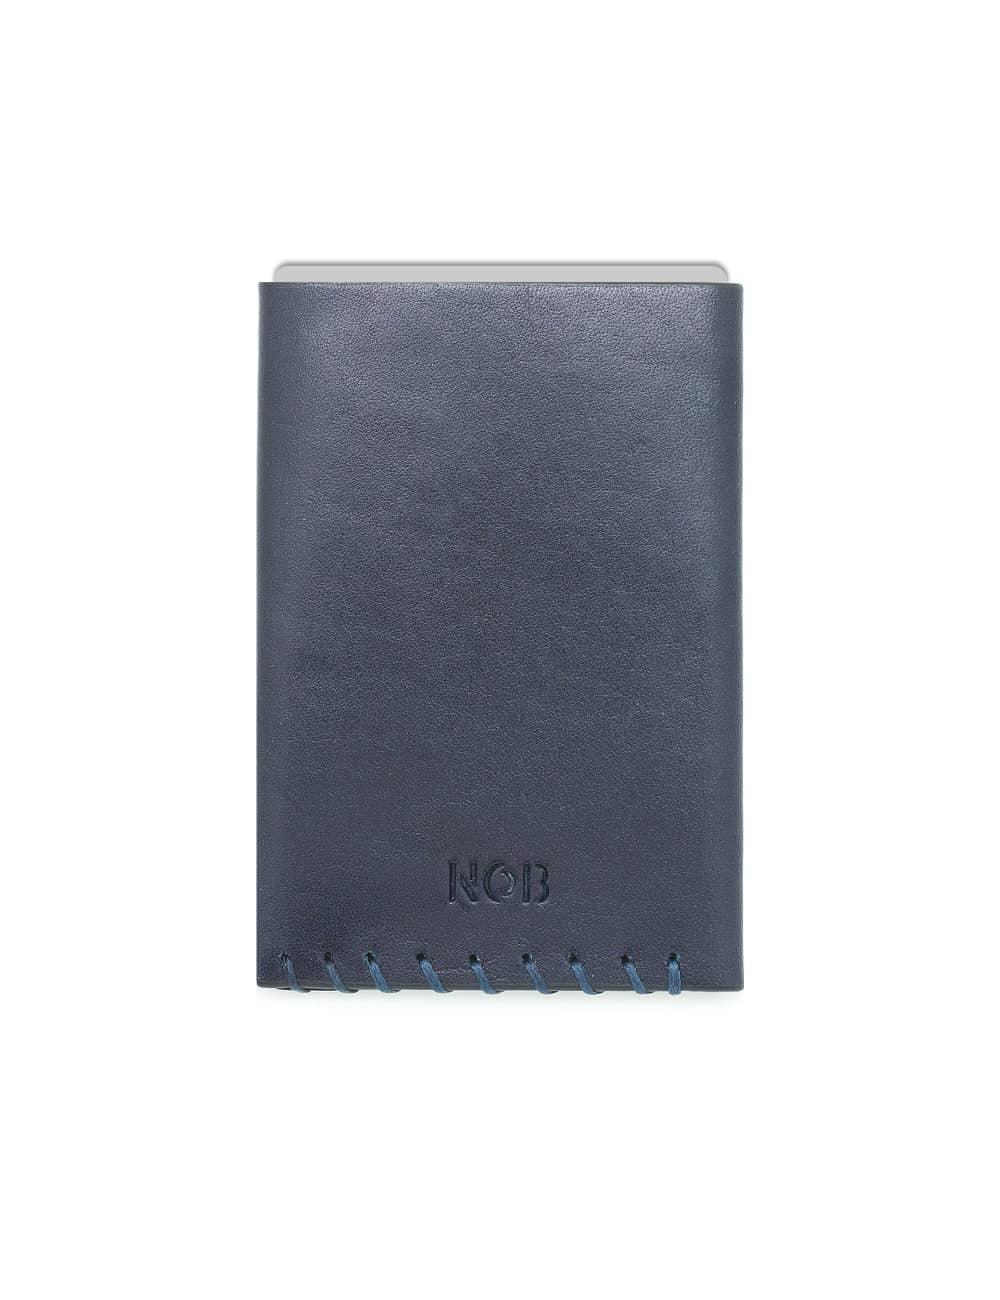 Navy 100% Genuine Top Grain Leather Card & Money Holder SLG7.NOB1